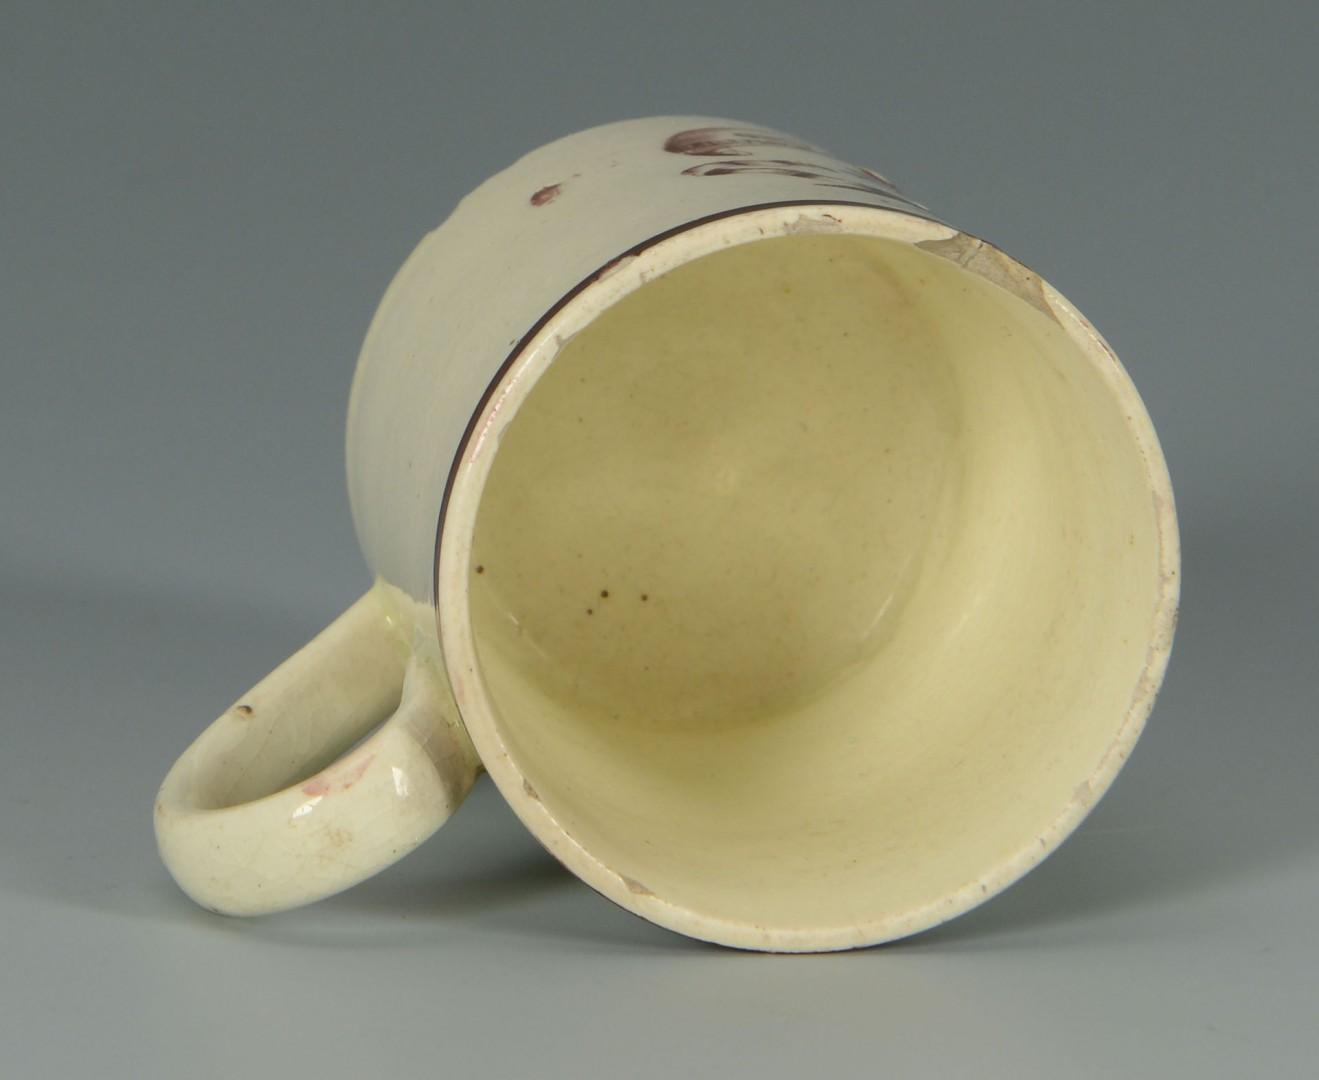 Lot 445: American Patriotic Transferware Child's Mug, Agric